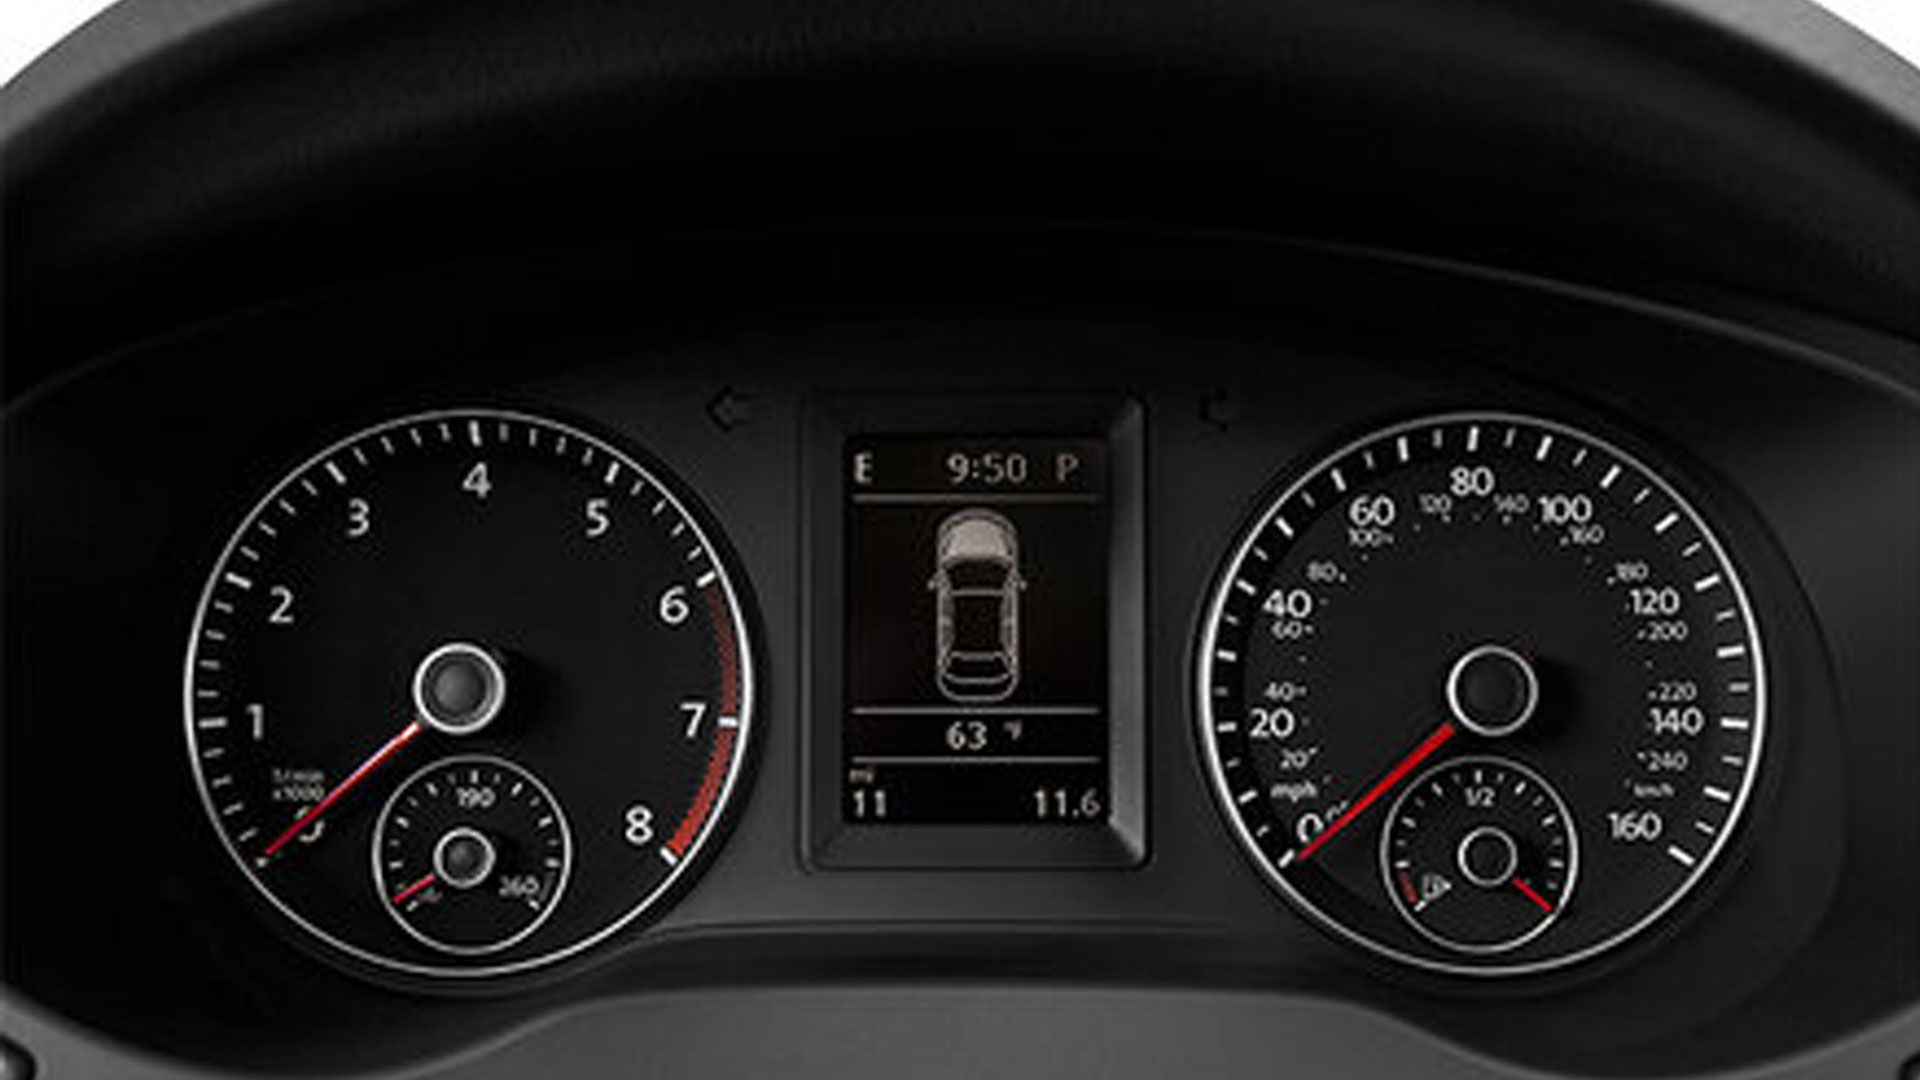 2014 volkswagen jetta gli display 2014 volkswagen jetta gli spesial edition 30